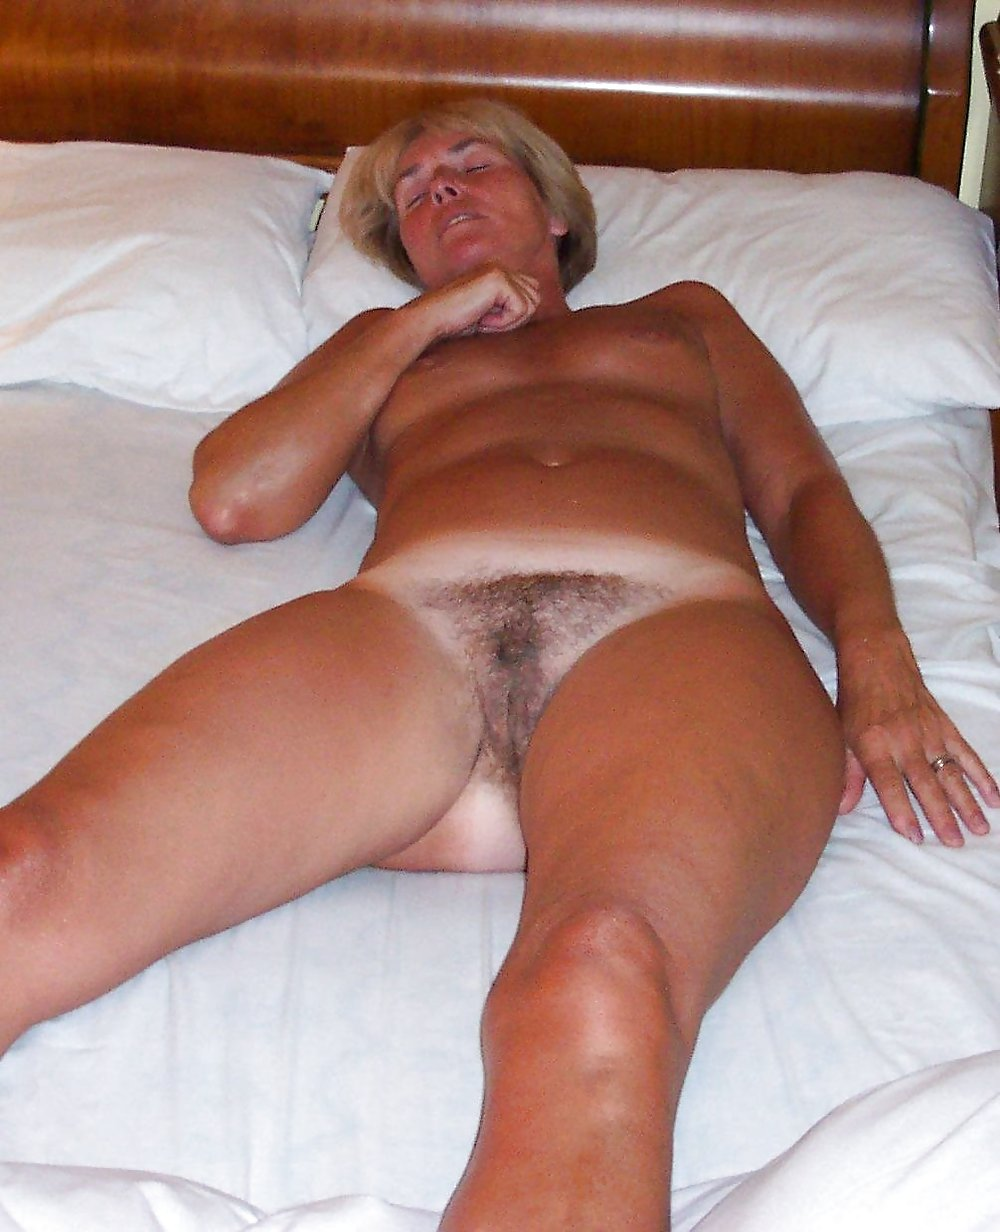 http://hotamateurmature.com/gallery/Housewives_milf_mature_elders/53.jpg